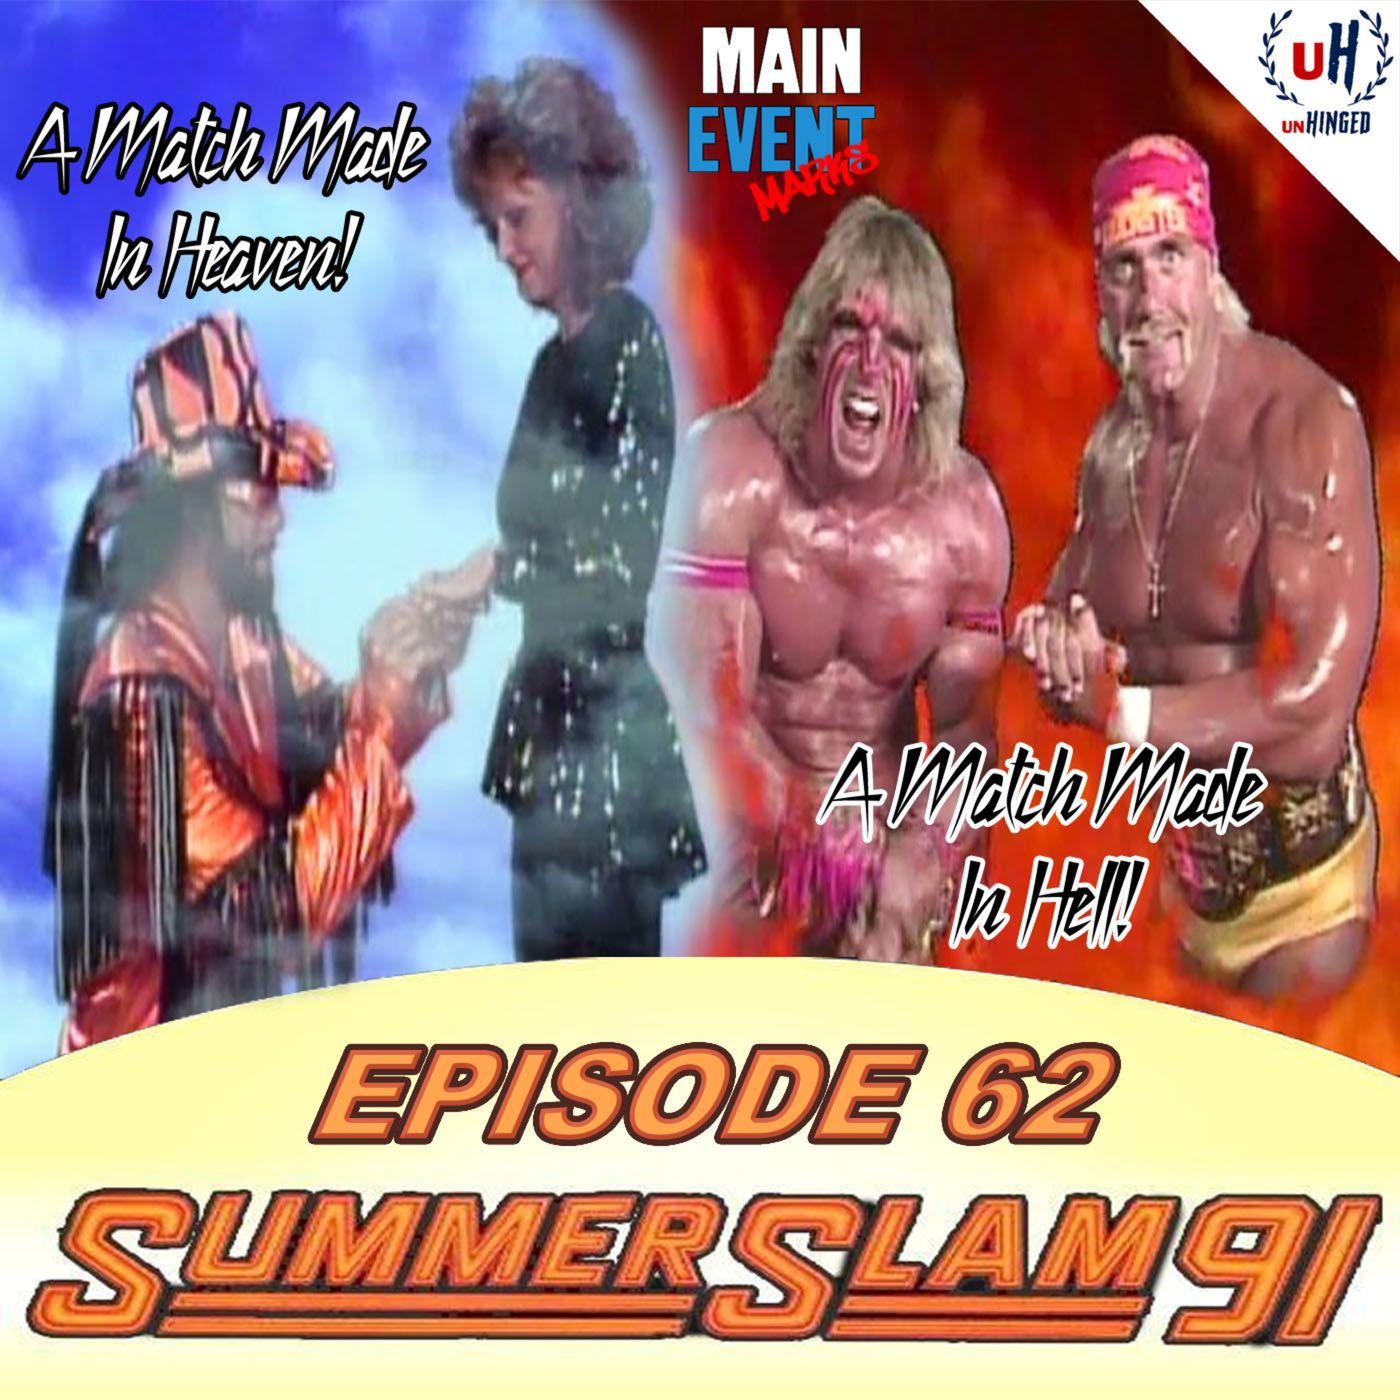 Episode 62: WWF SummerSlam 1991